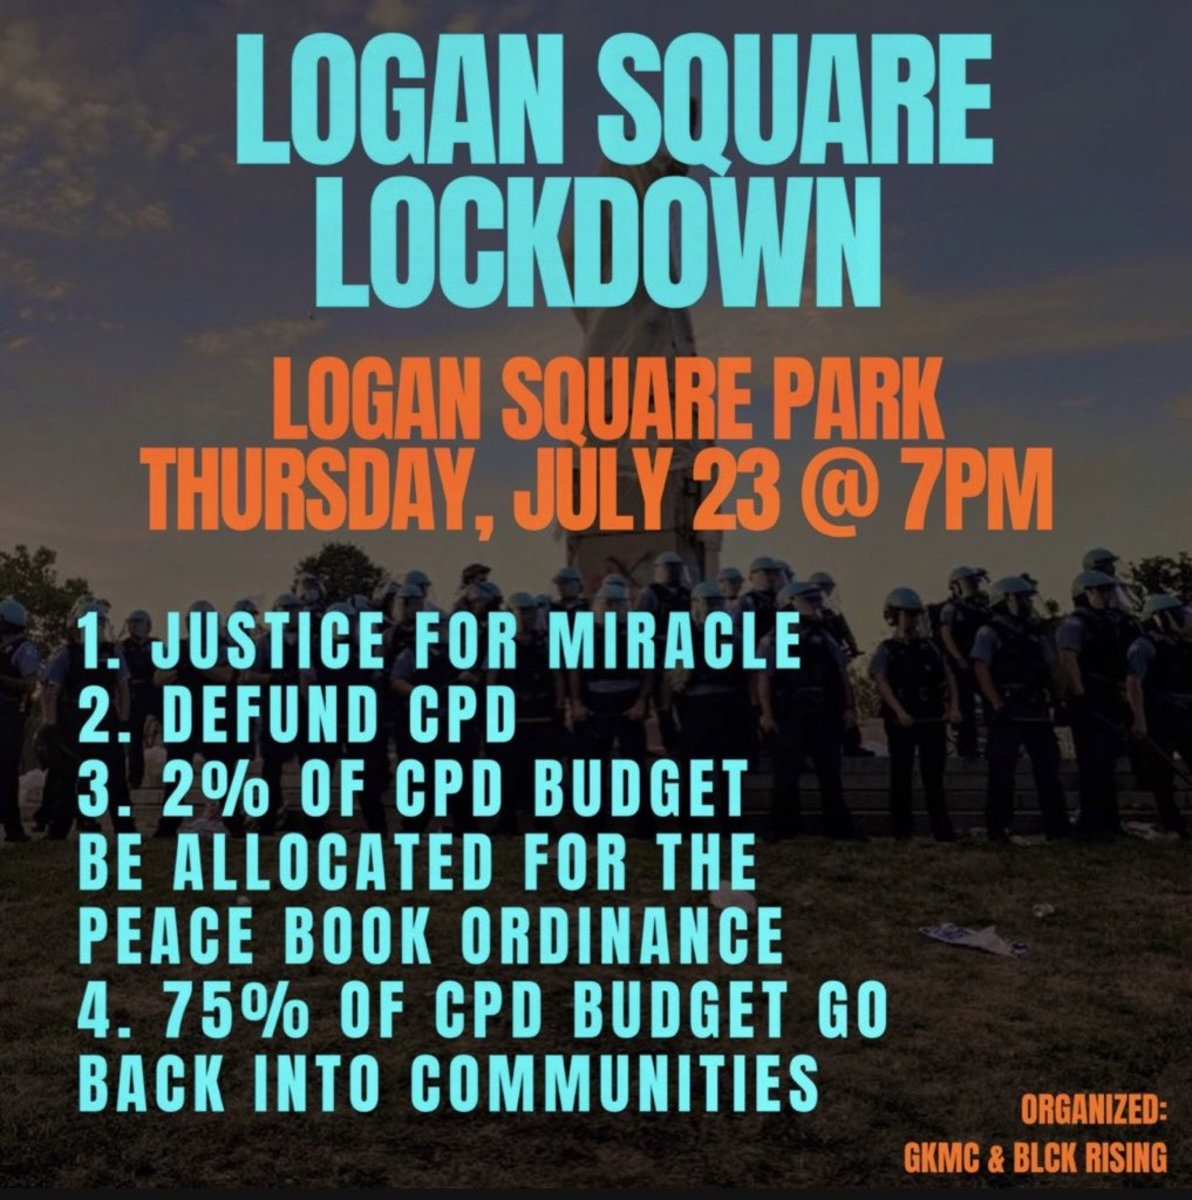 logan-square-lockdown